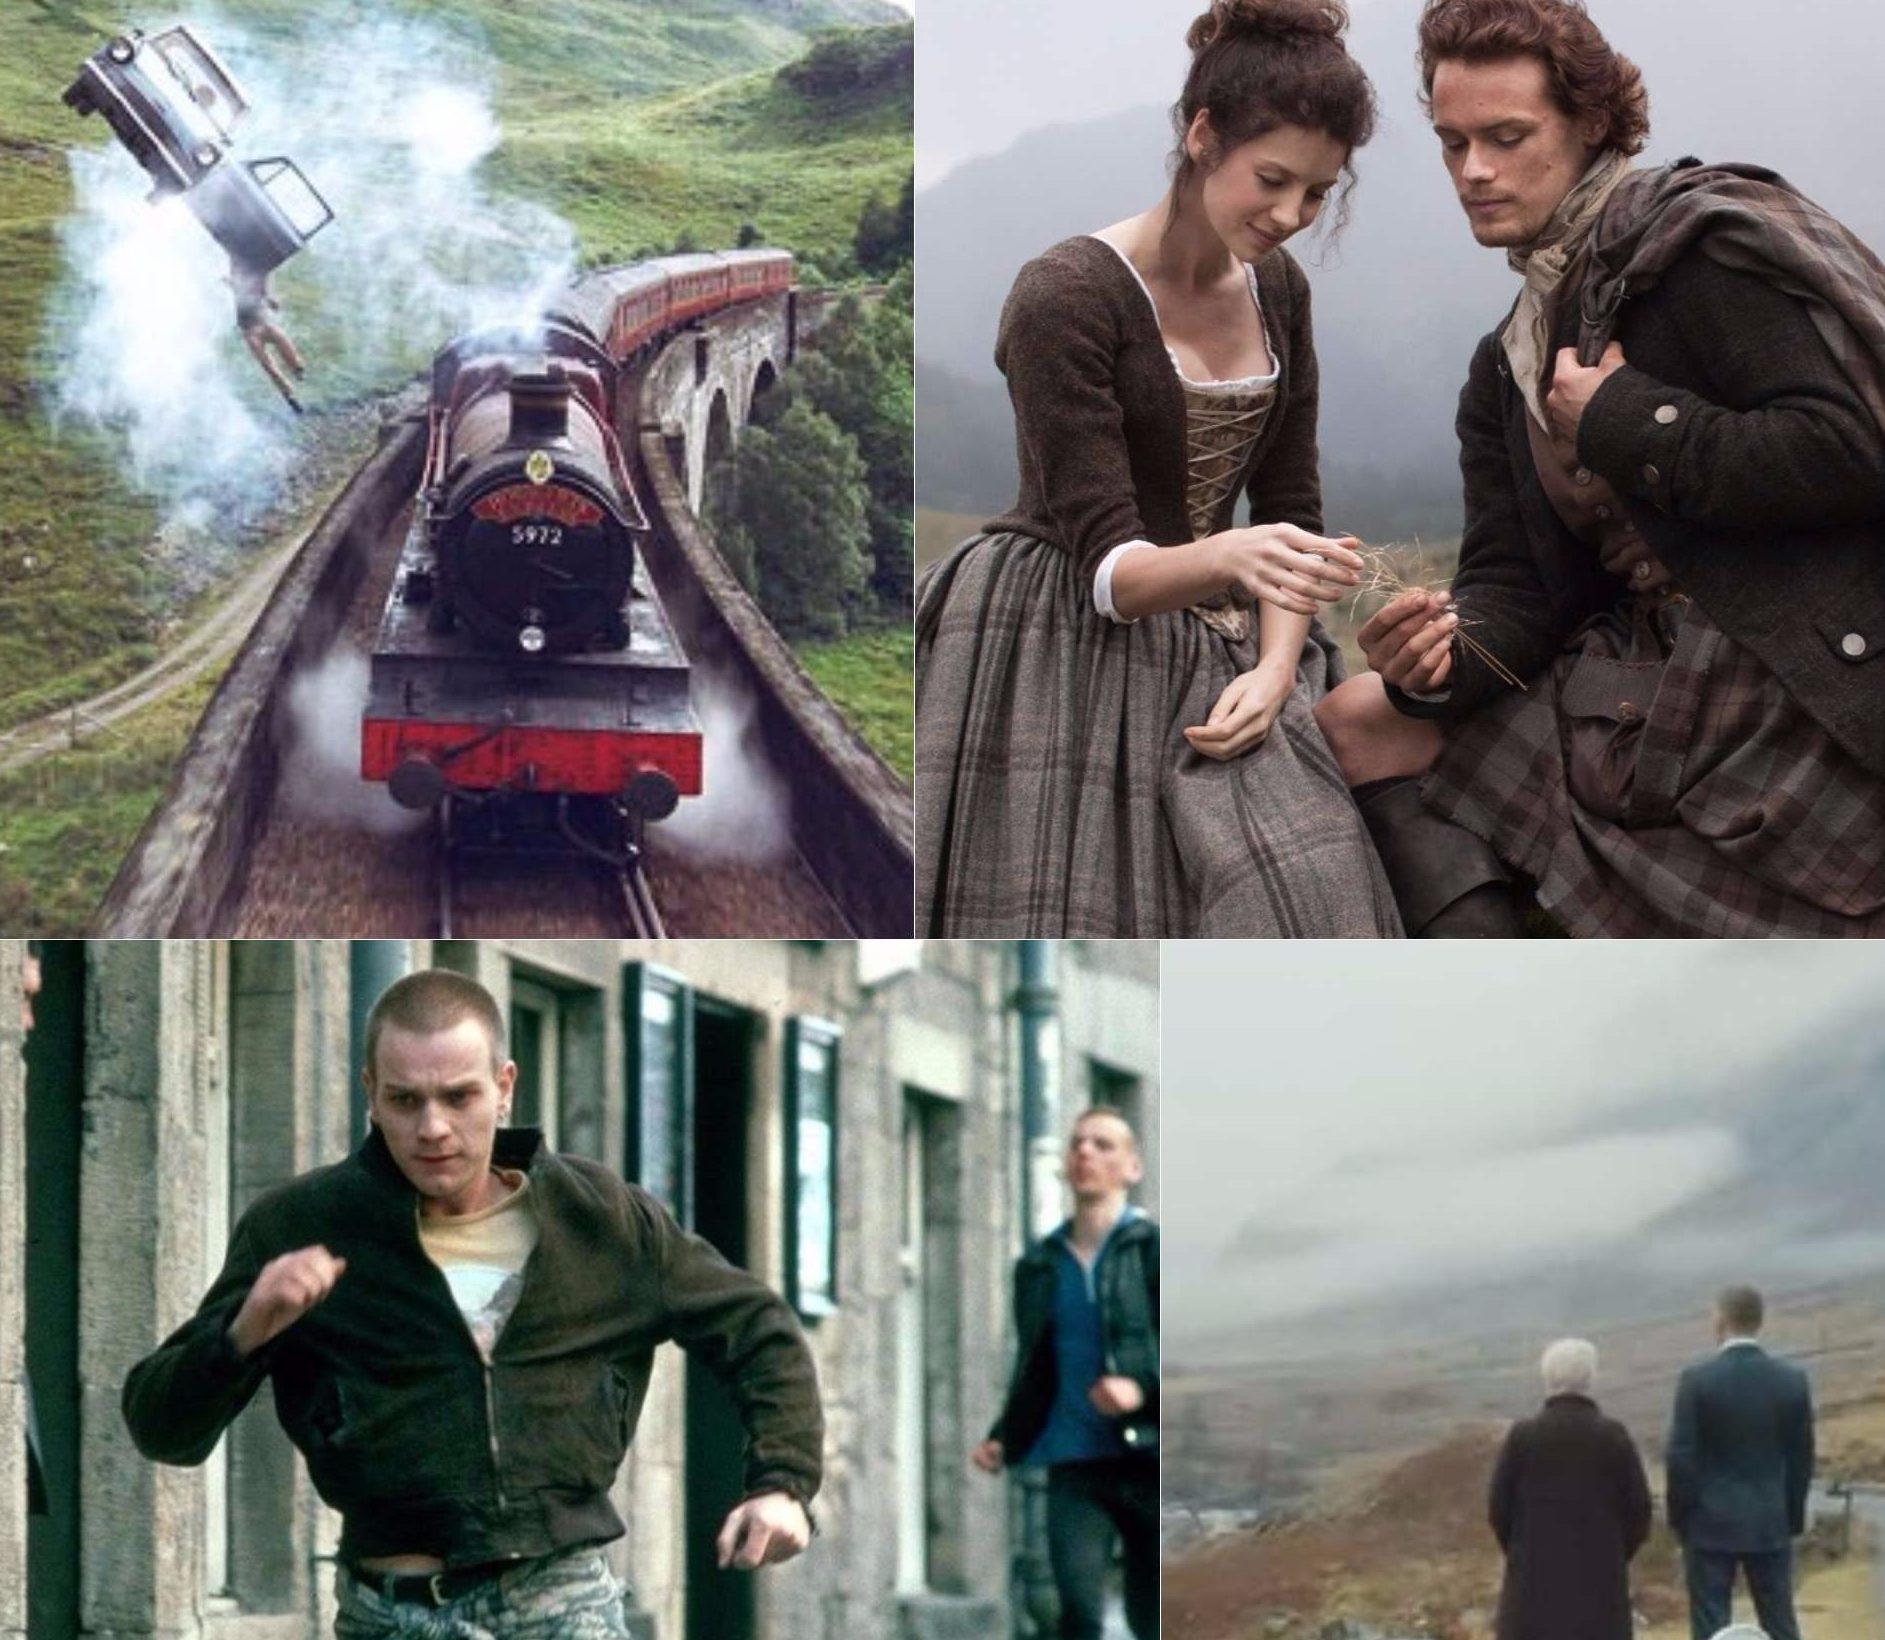 Filming locations Scotland